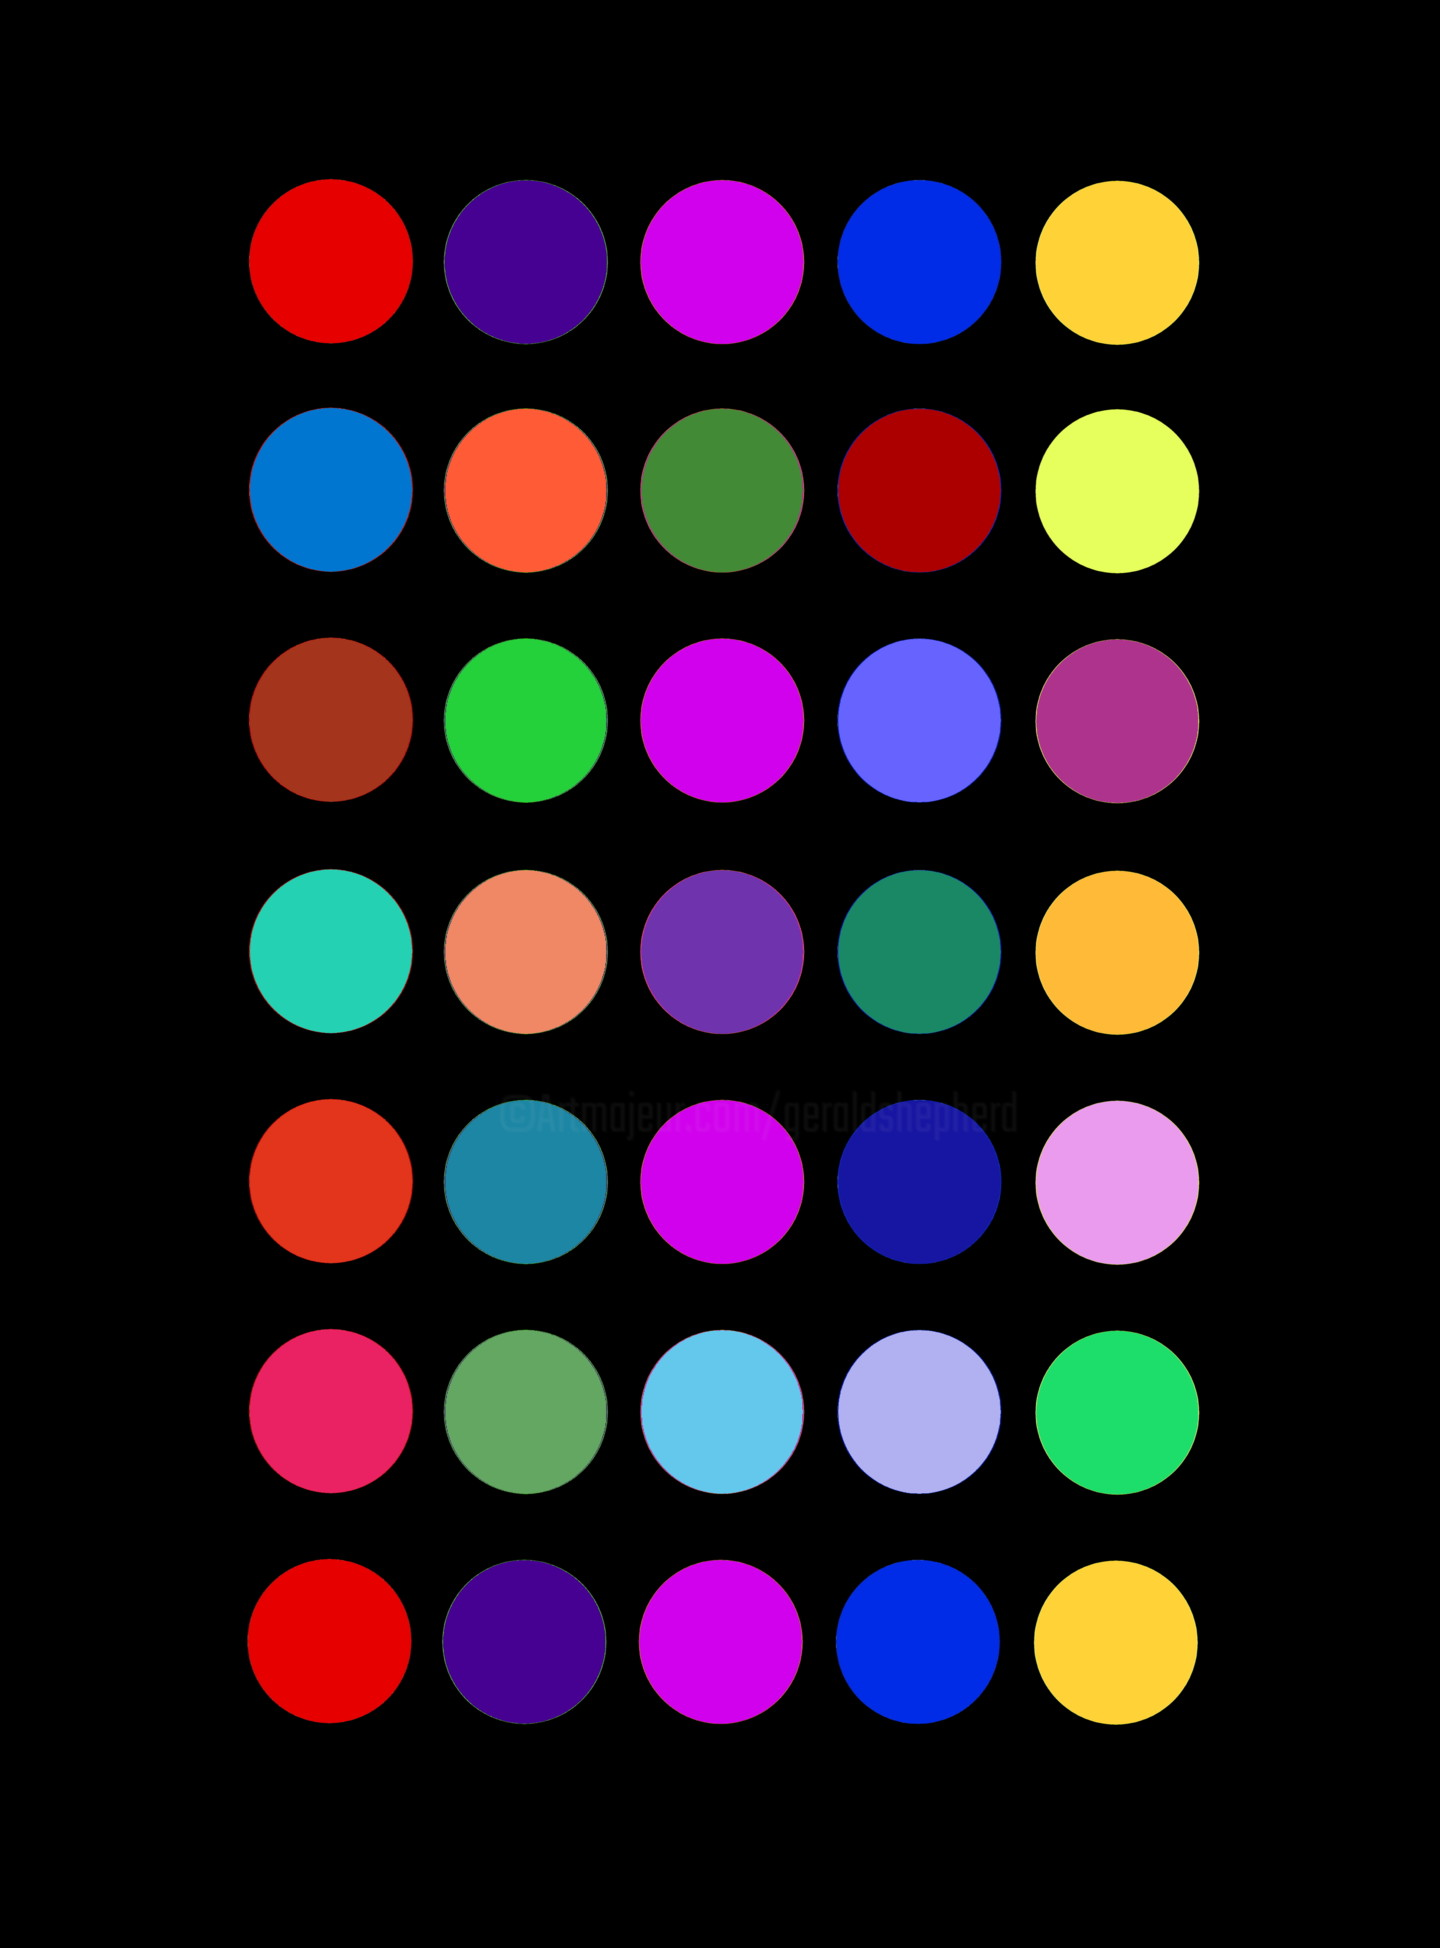 Gerald Shepherd - Coloured Circle Changes